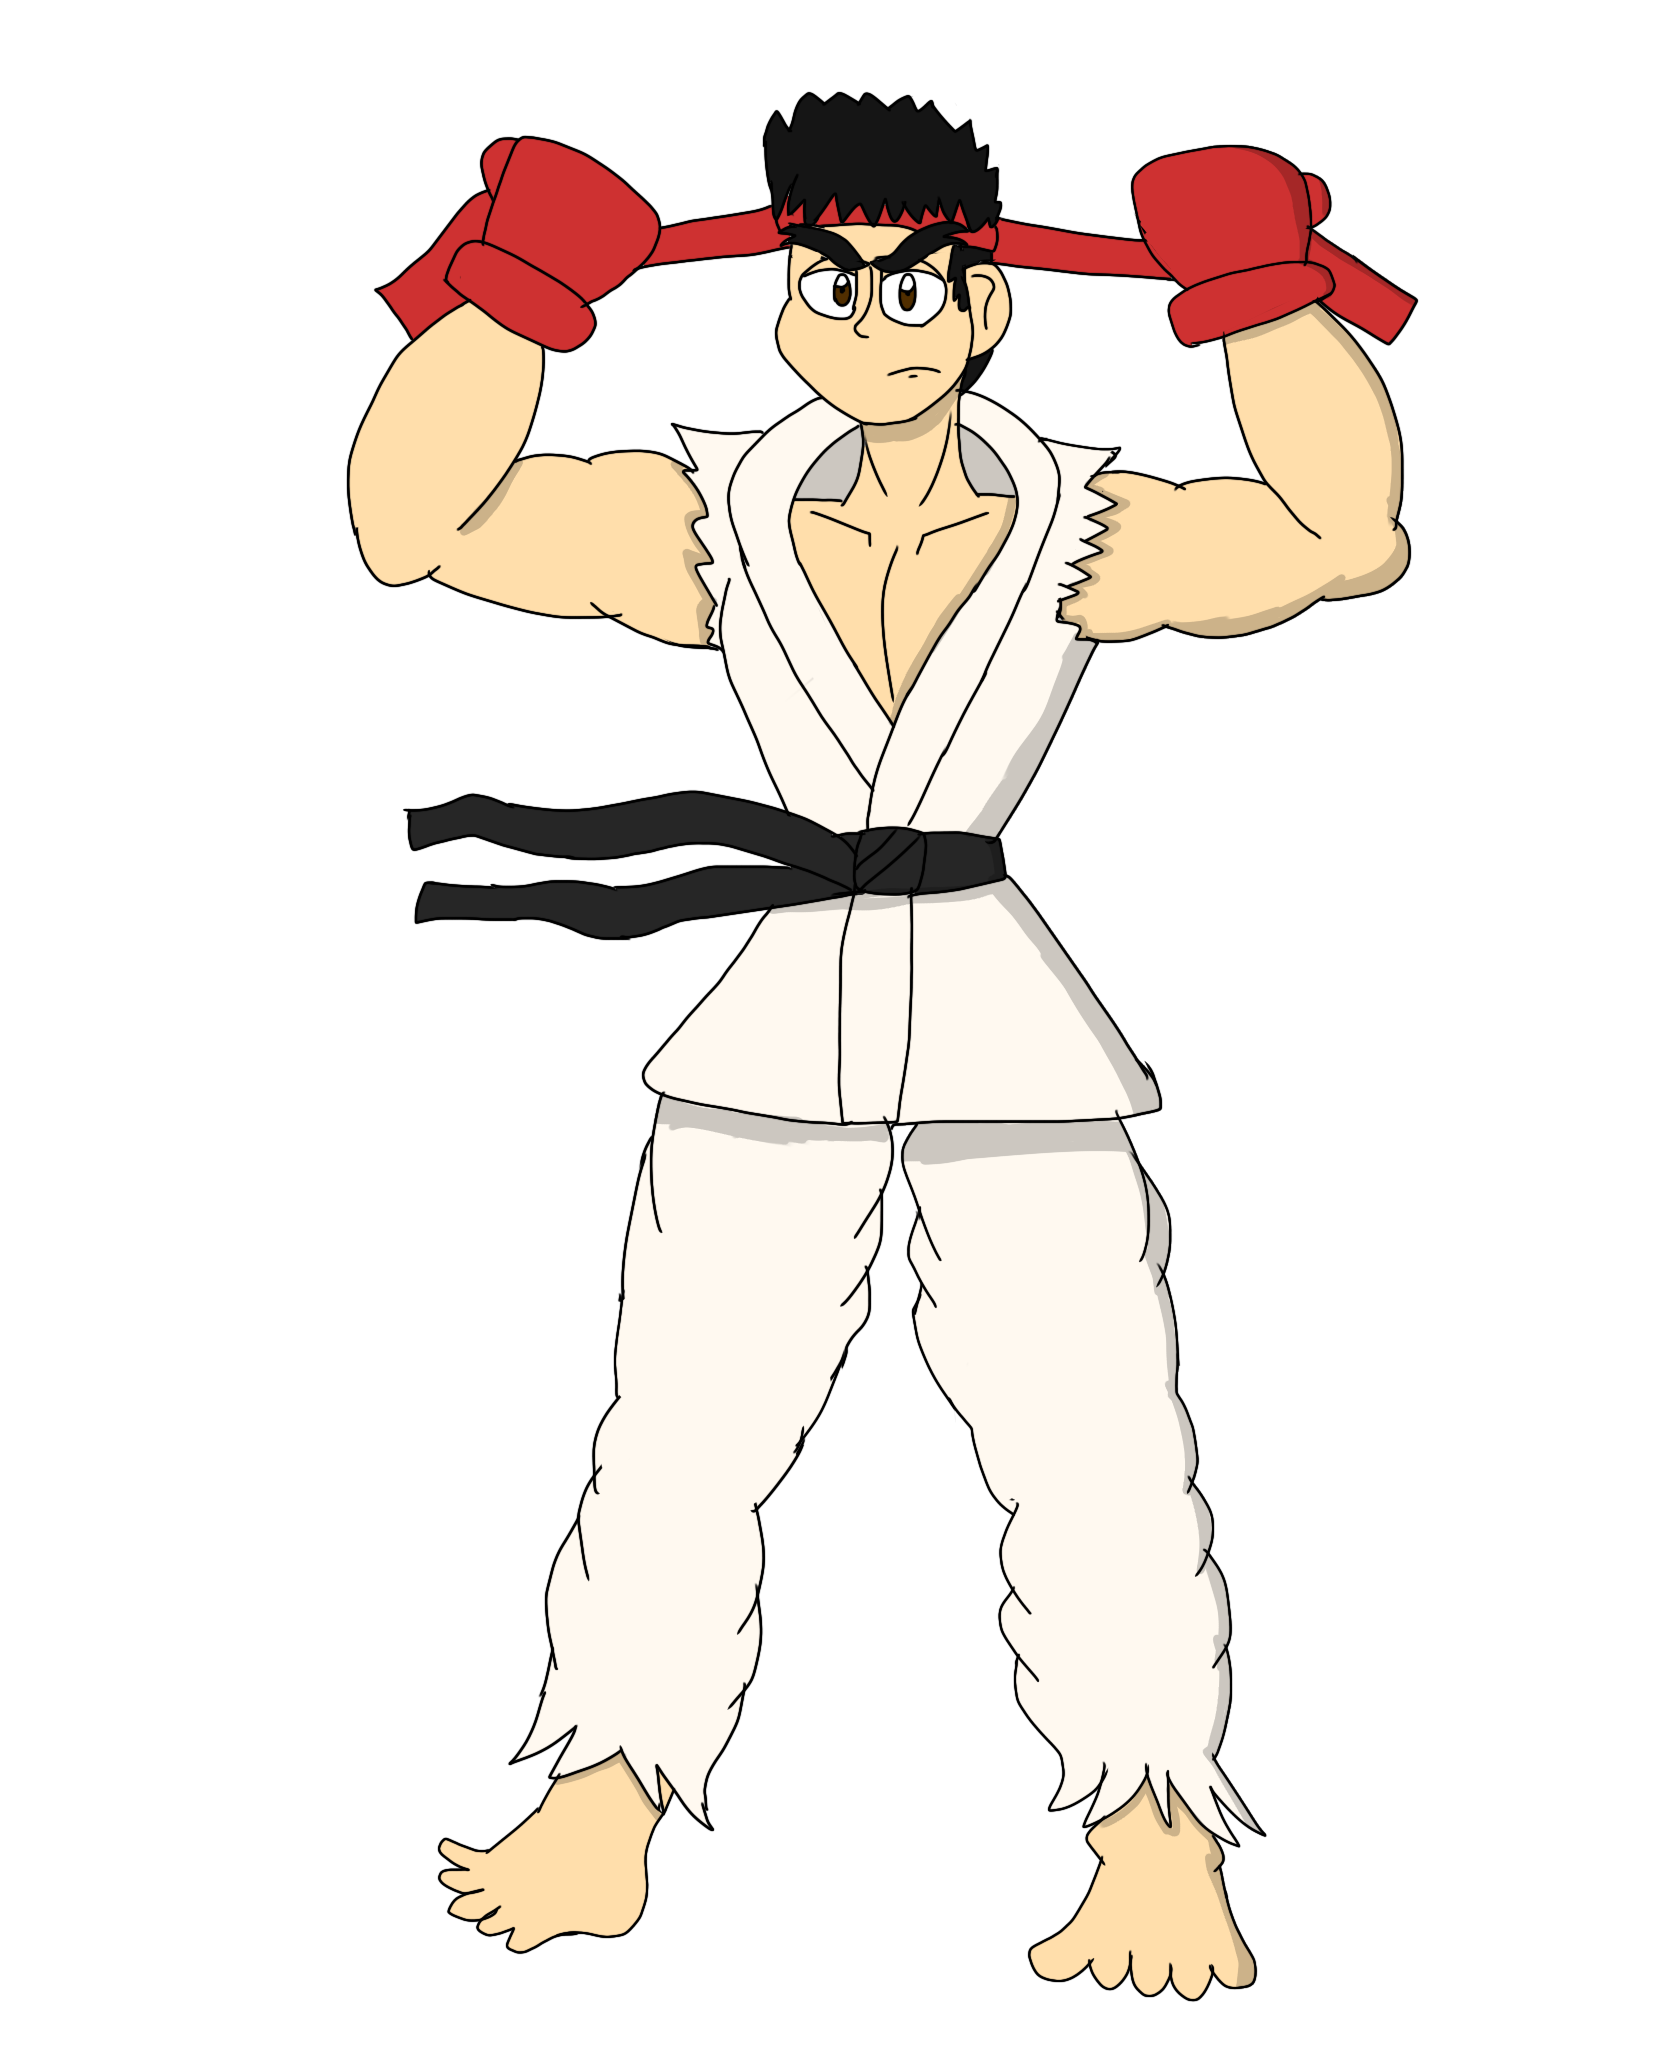 Ryu By Joshintosh On Newgrounds